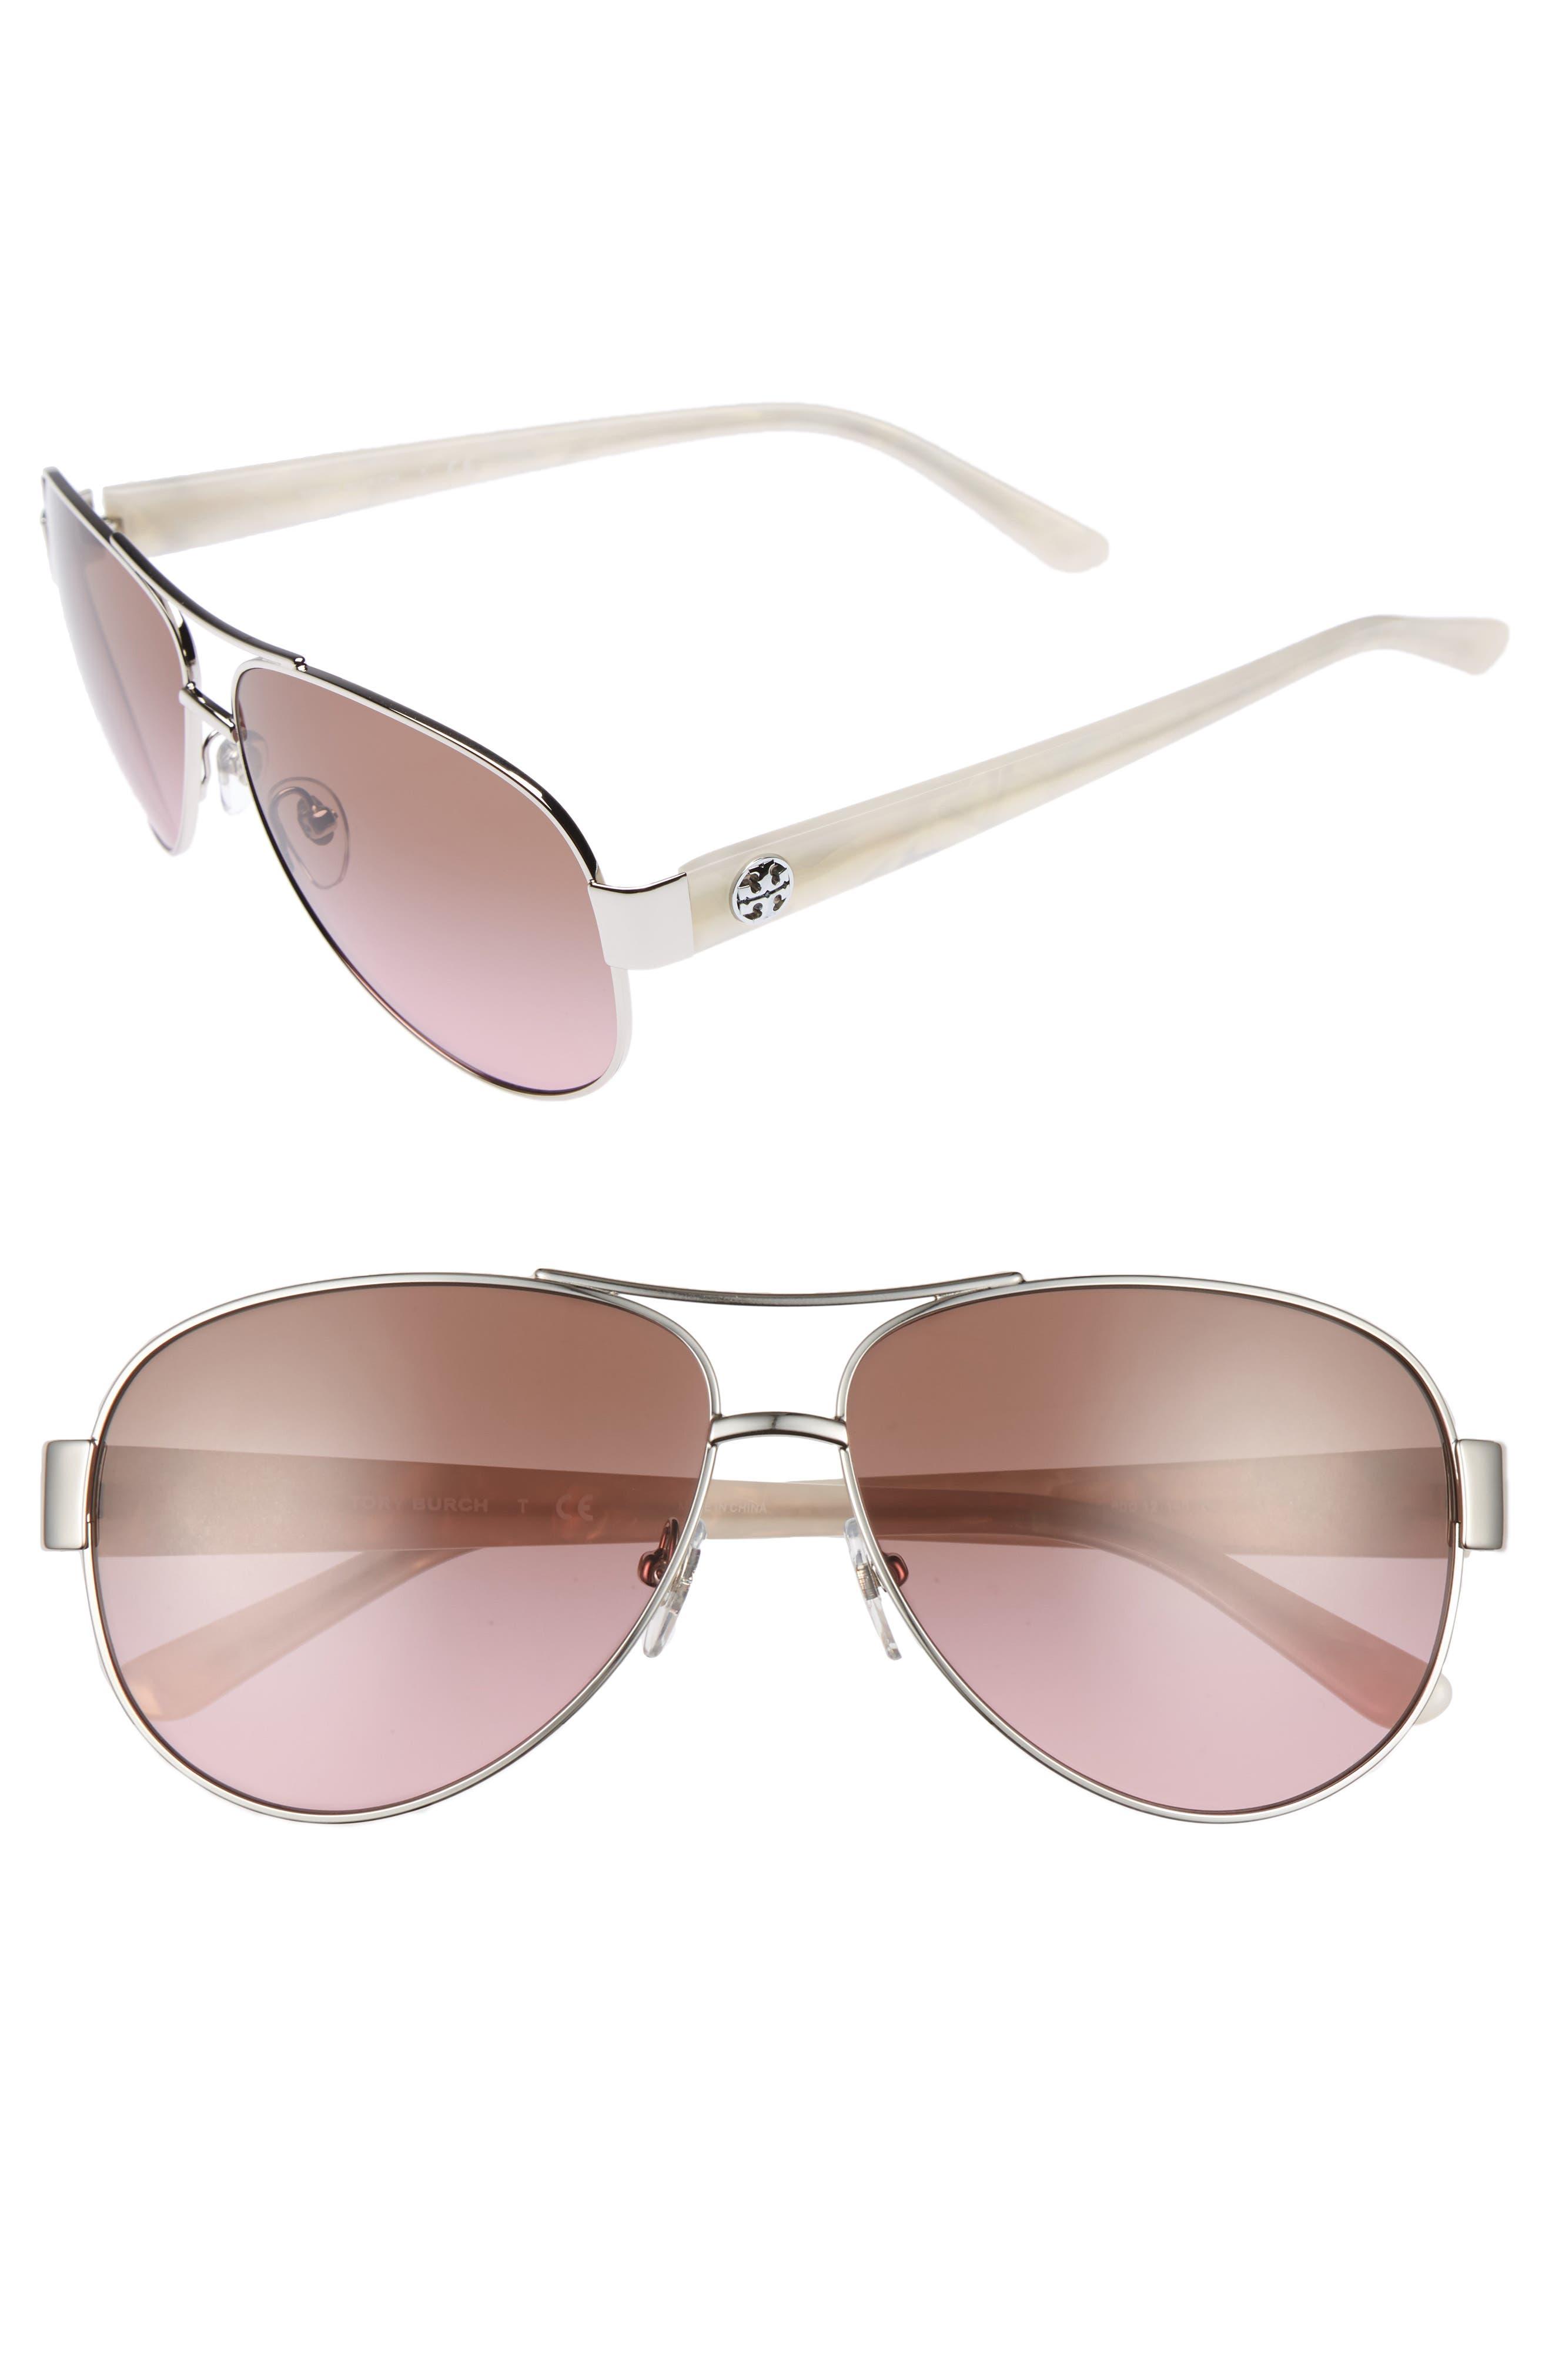 Tory Burch 60mm Aviator Sunglasses